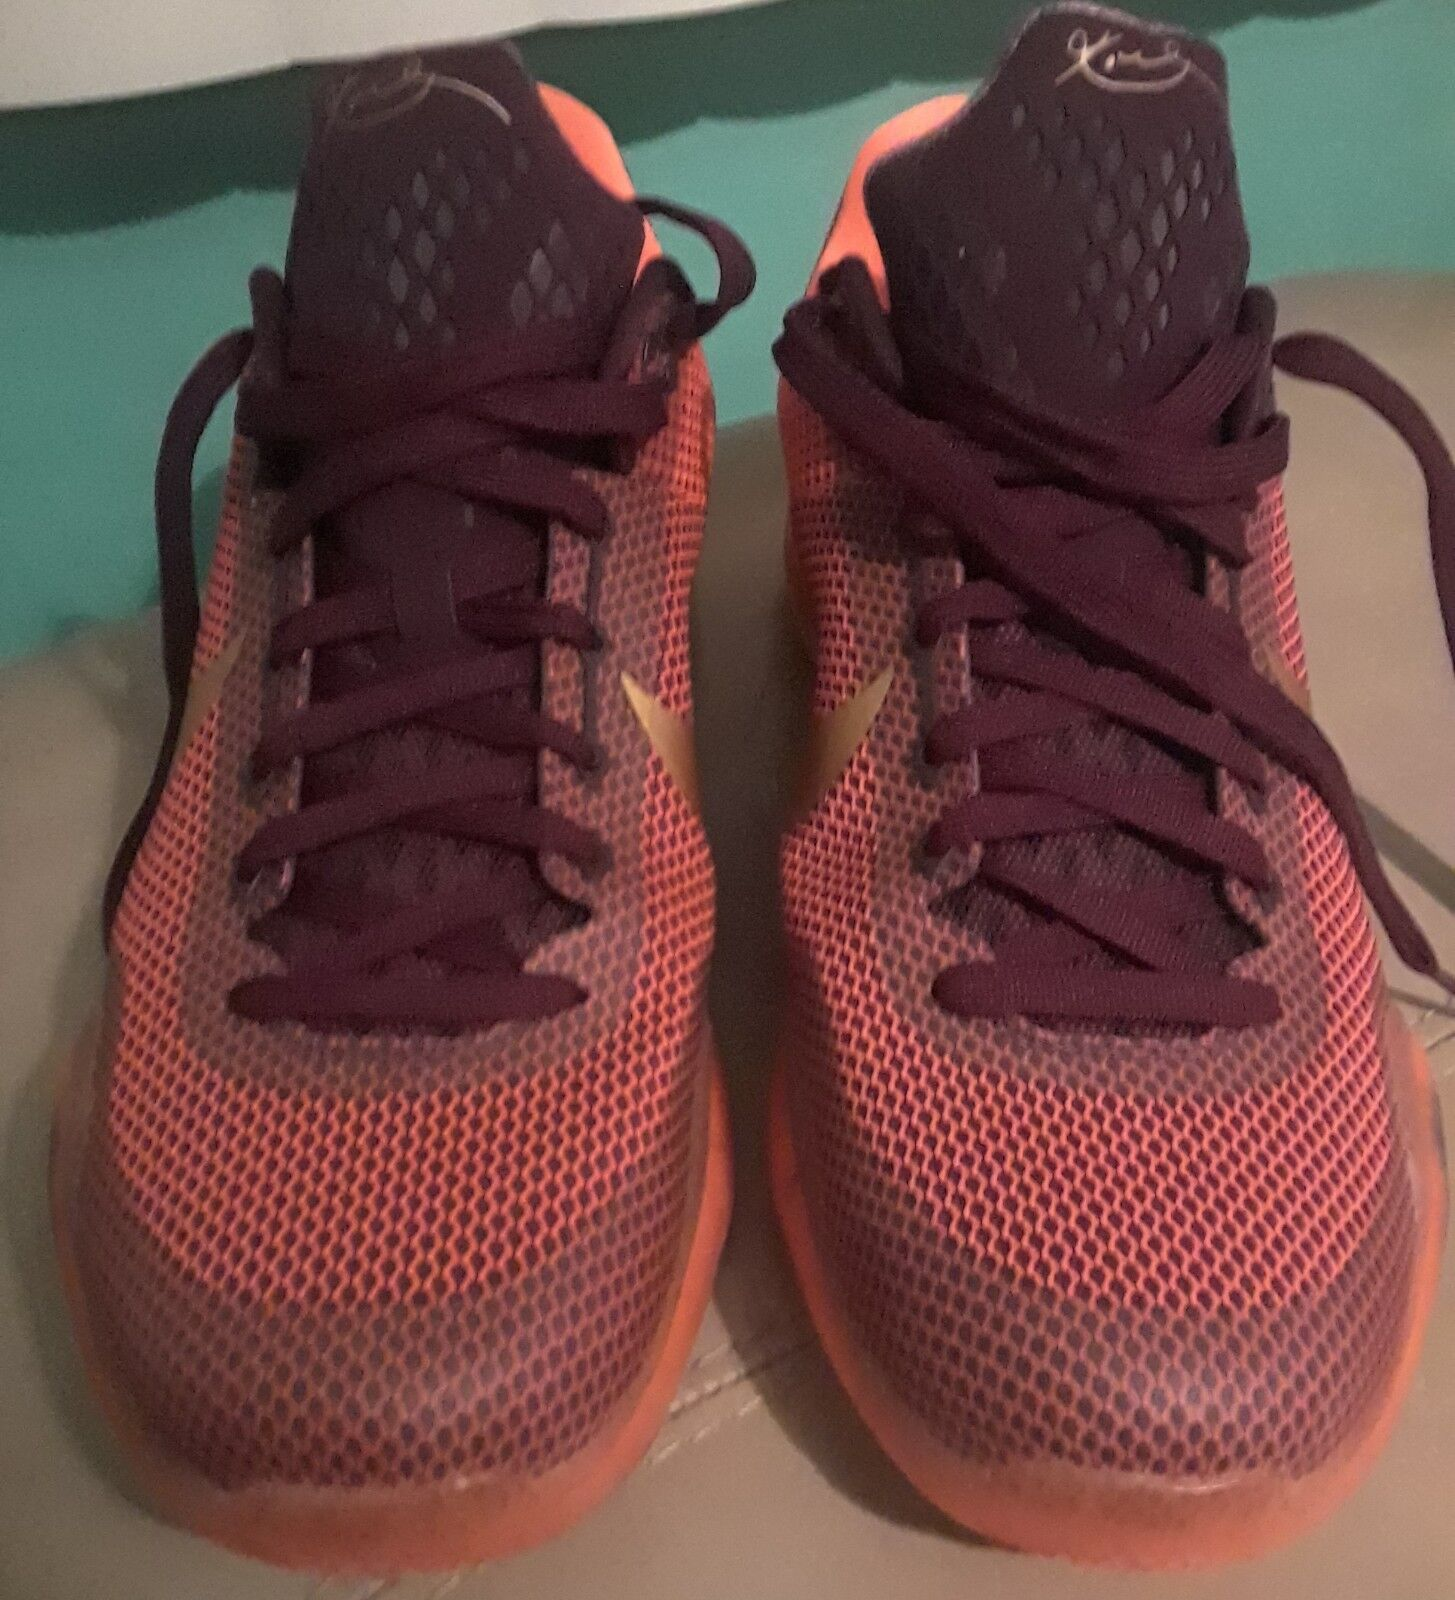 Nike Kobe X 10 Silk Road Orange merlot Villian Red Metallic Gold Size 12 With Bo